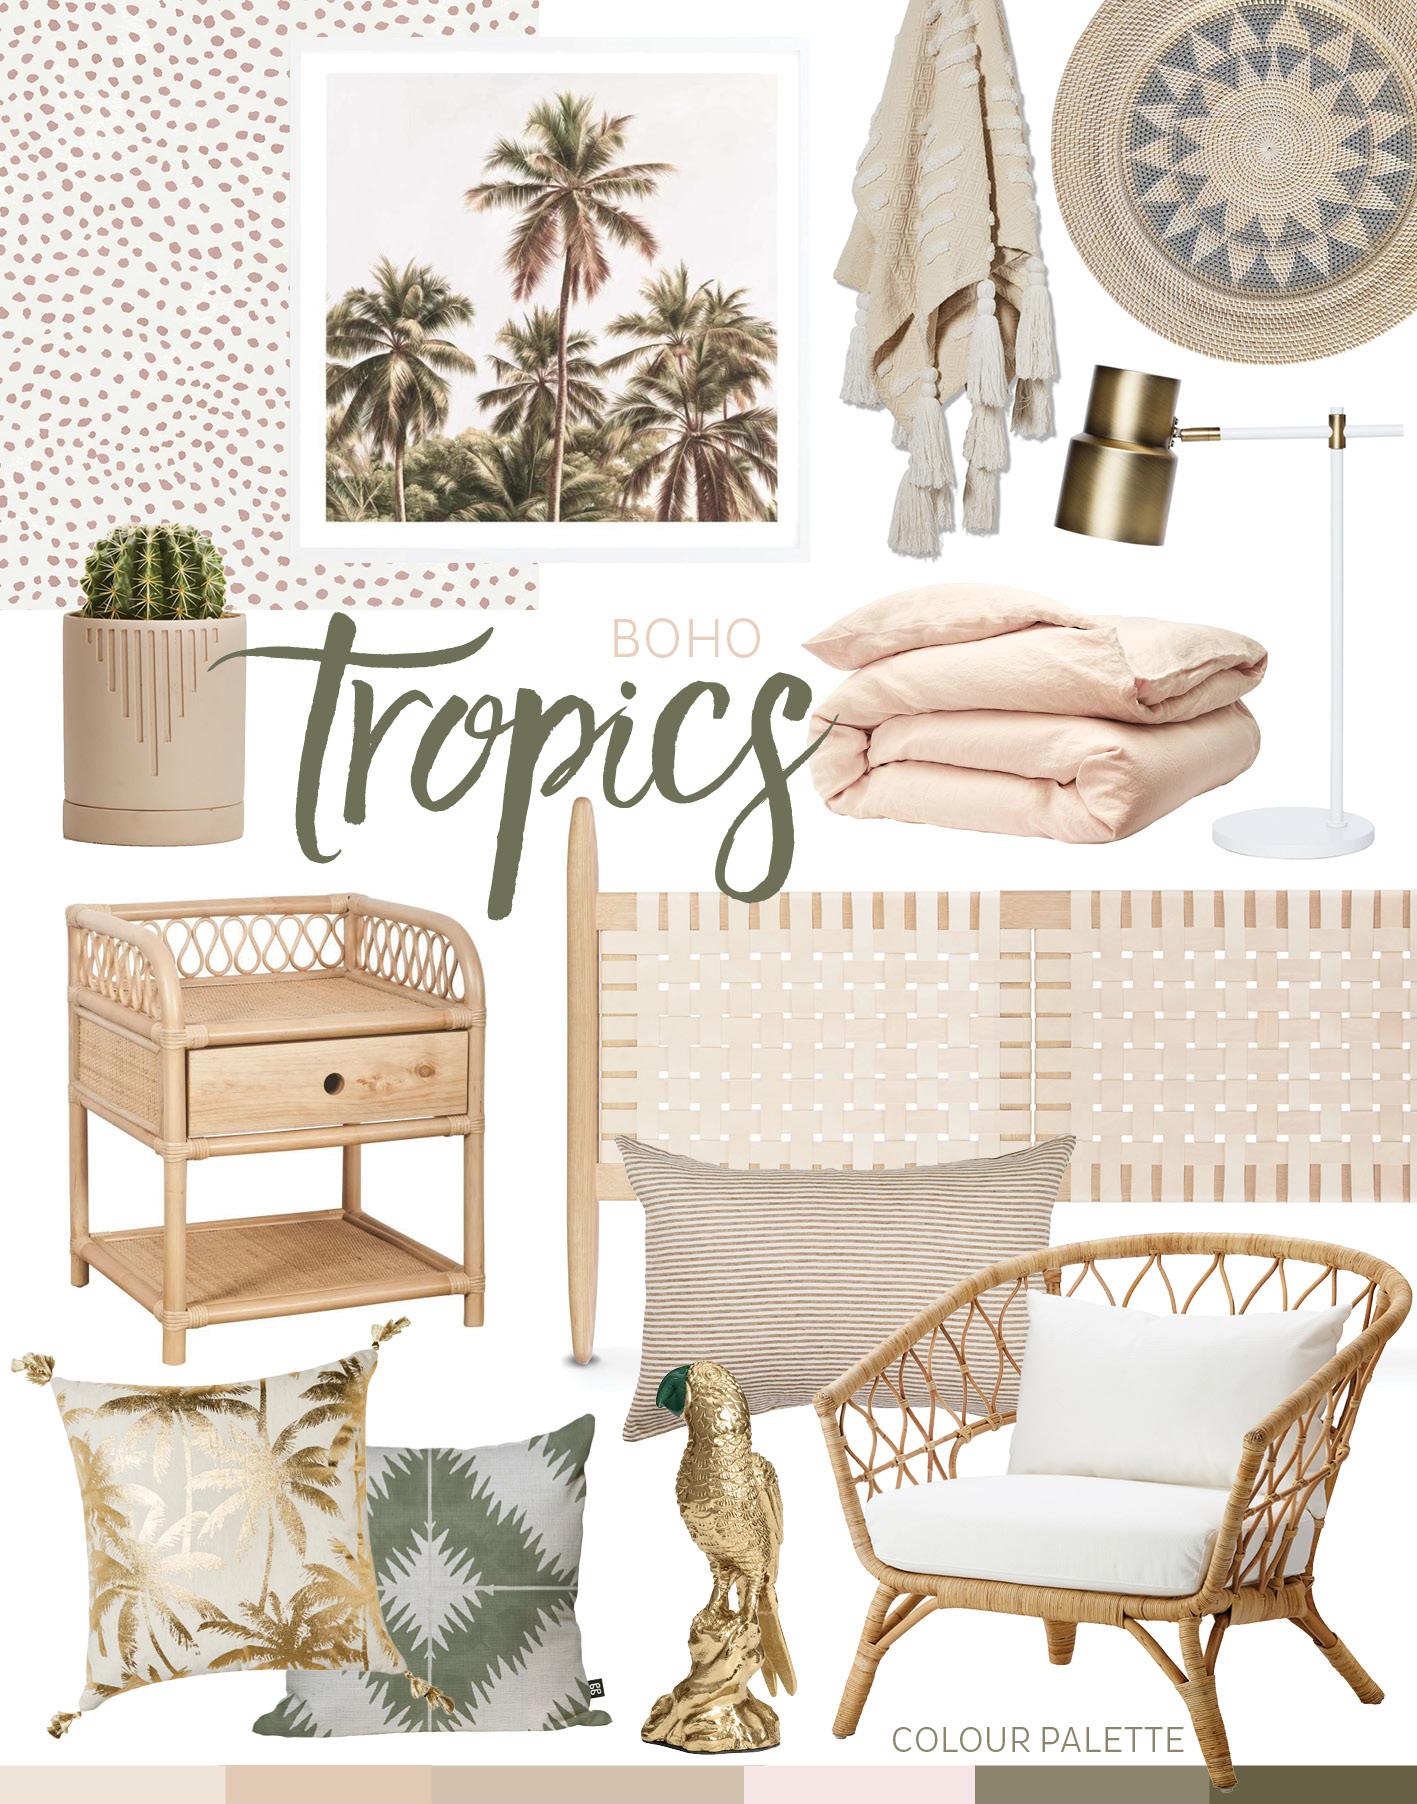 adore_home_blog_boho_tropics_tropical_modern_gold_brass_olive_green_palm_tree.jpg